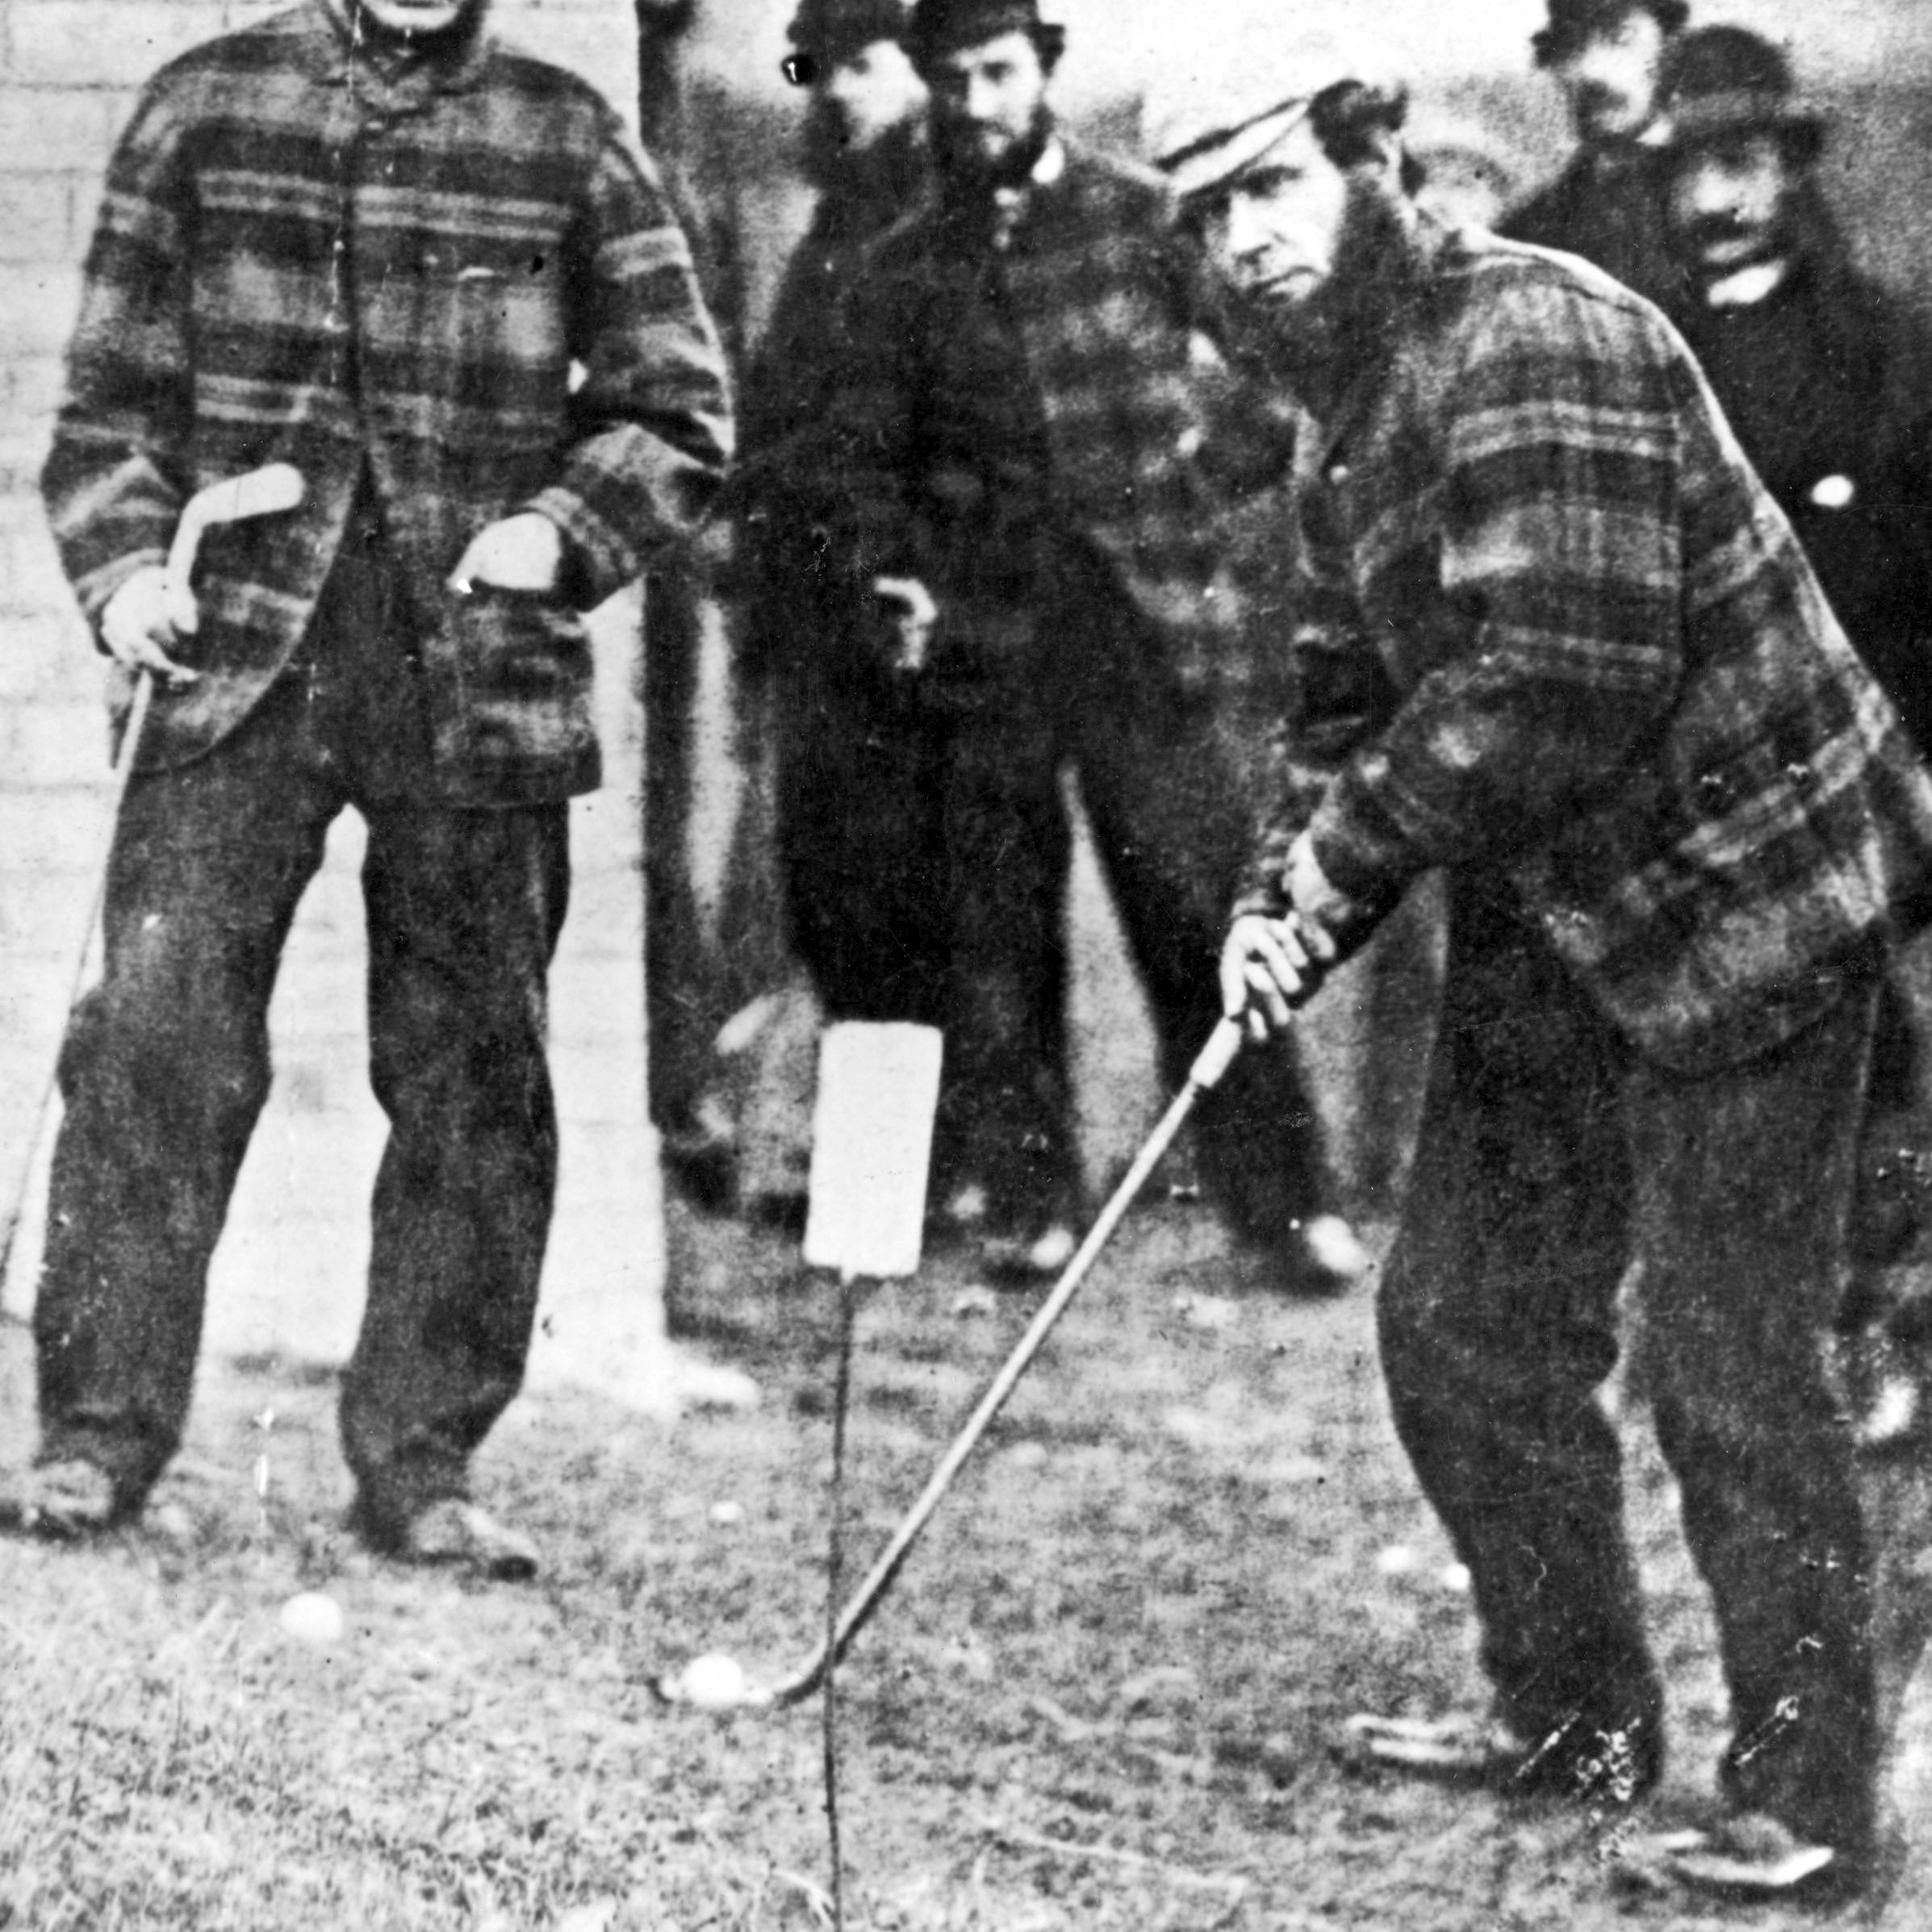 Tom Morris Sr. pictured at Prestwick around 1860